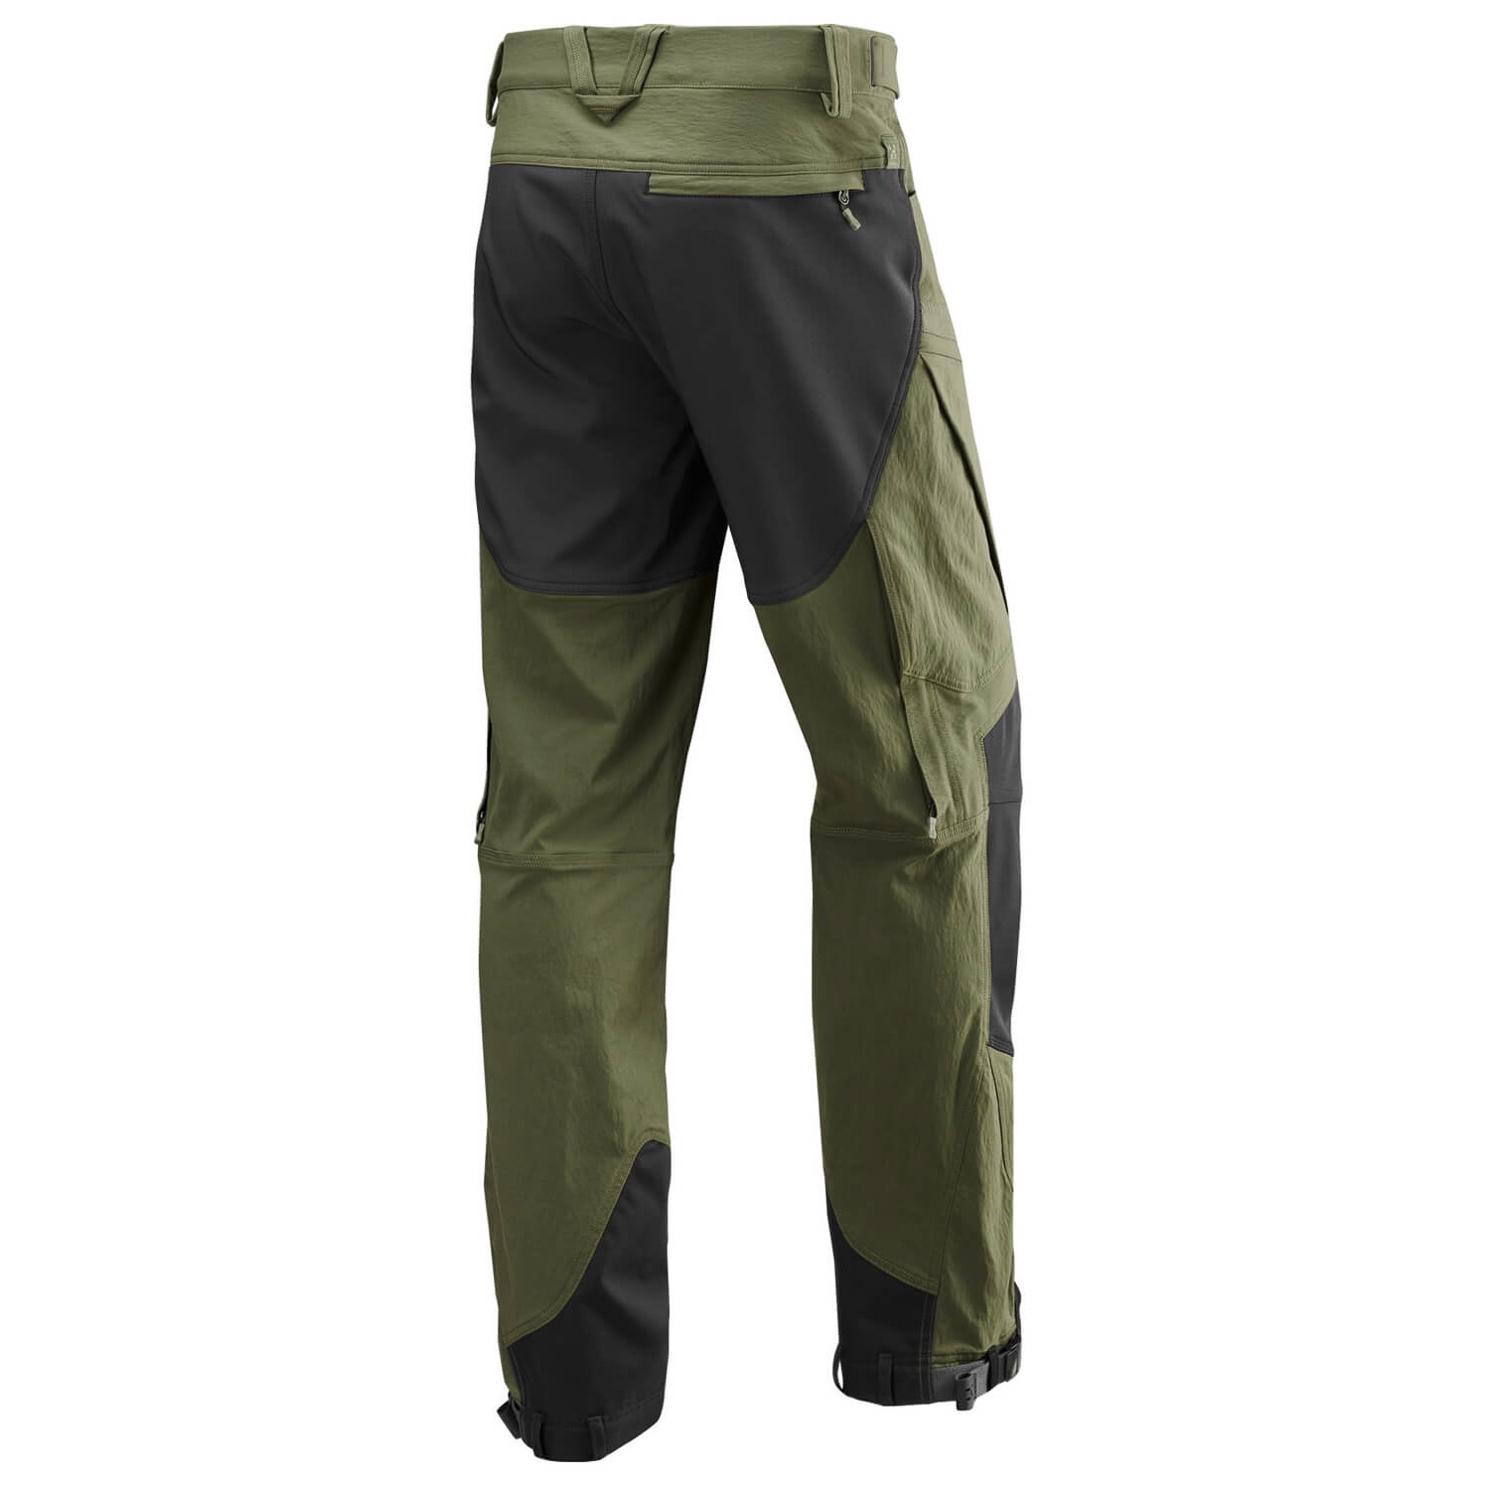 Pantalon Homme Rugged Ii Softshell Haglöfs Pant Achat Mountain qv6wnUI